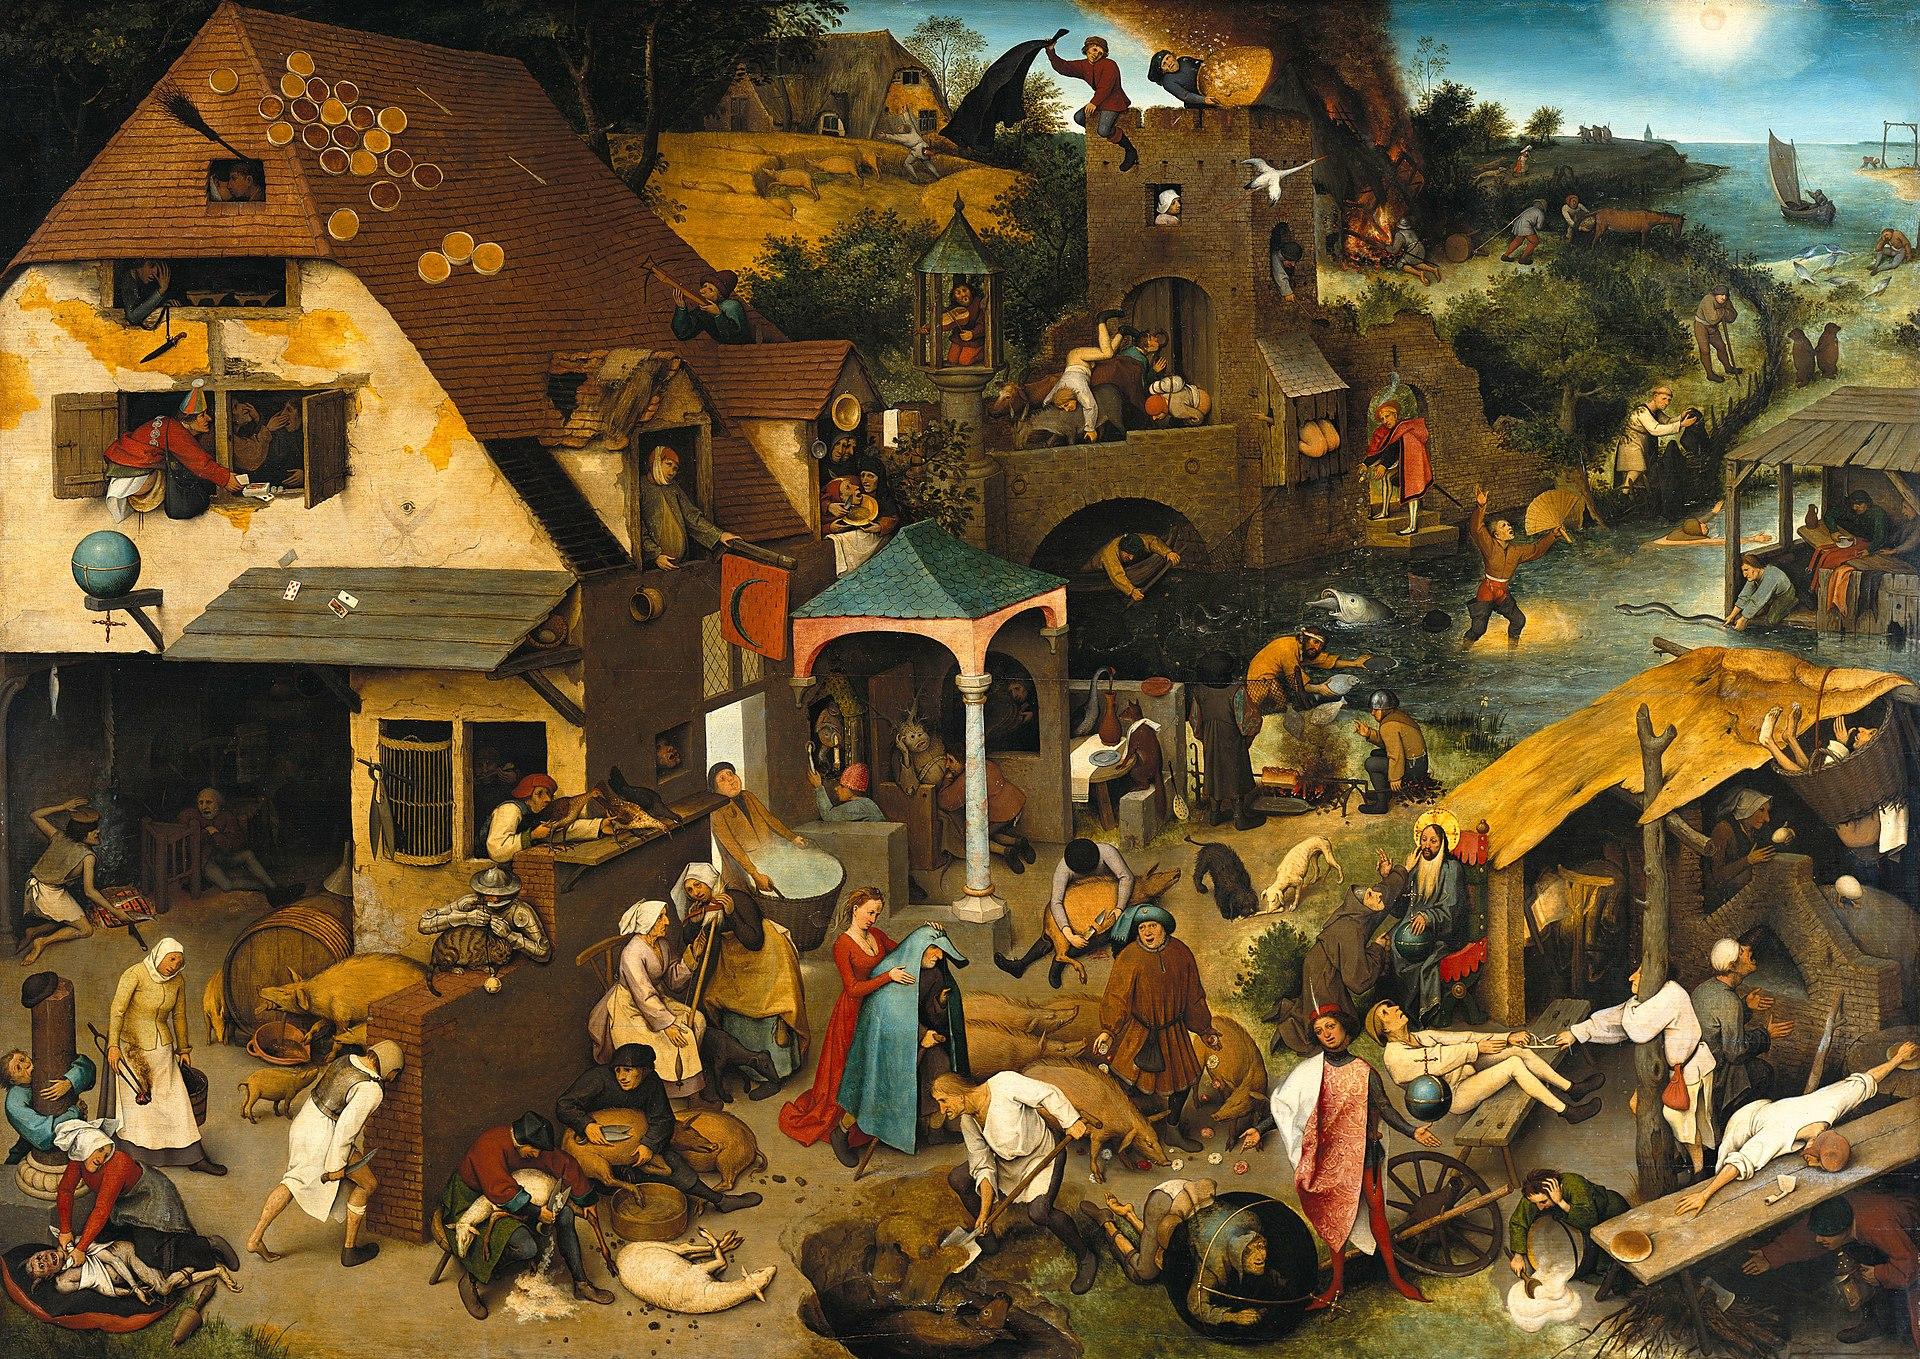 Питер Брейгель, 1559 год, картина «Нидерландские пословицы».